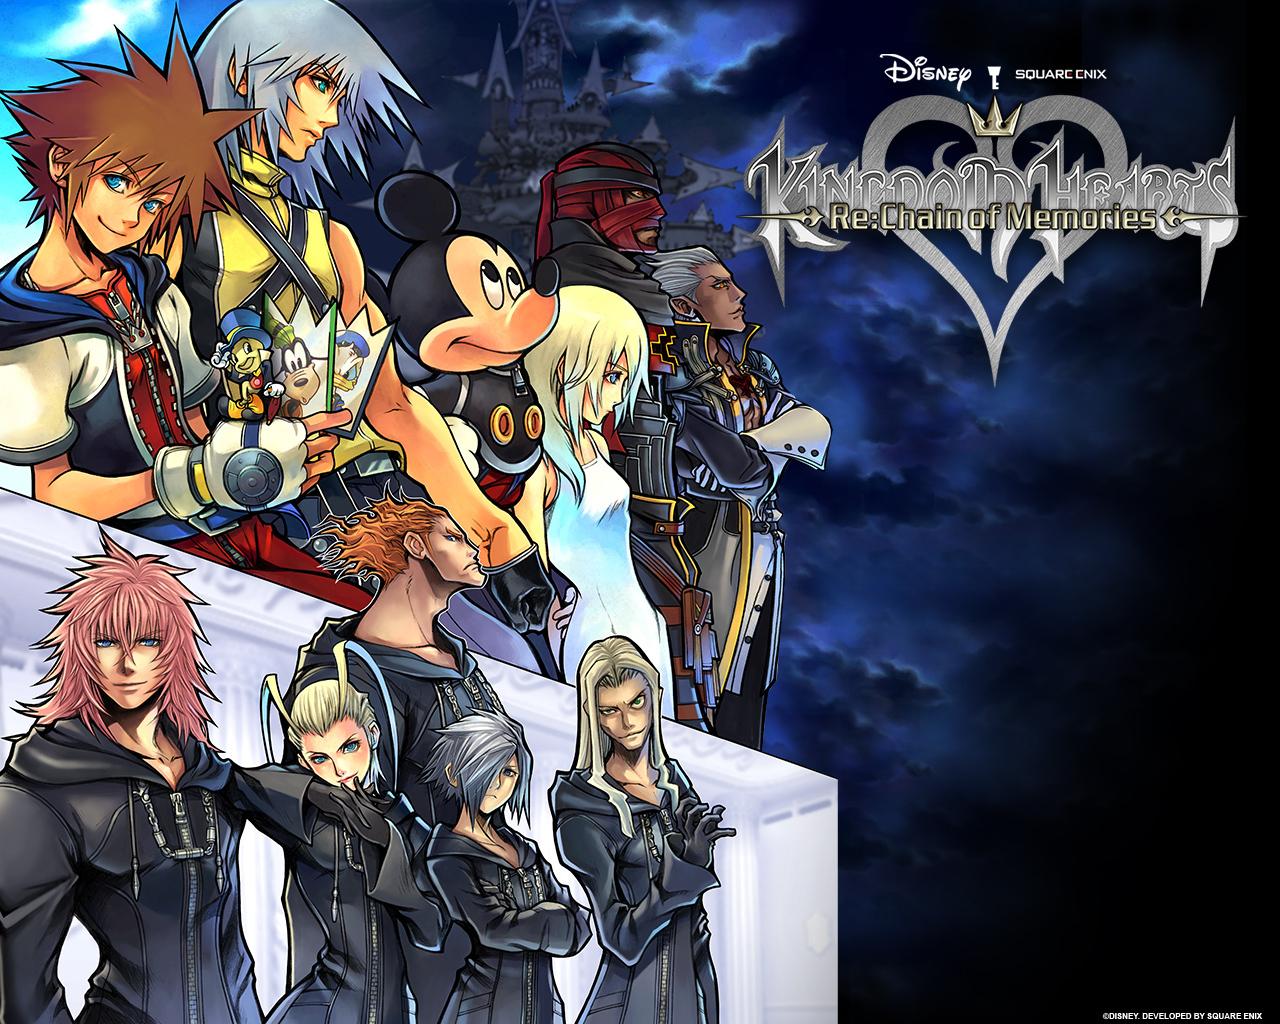 Official Kingdom Hearts Wallpaper kingdom hearts series 2754173 1280 1280x1024